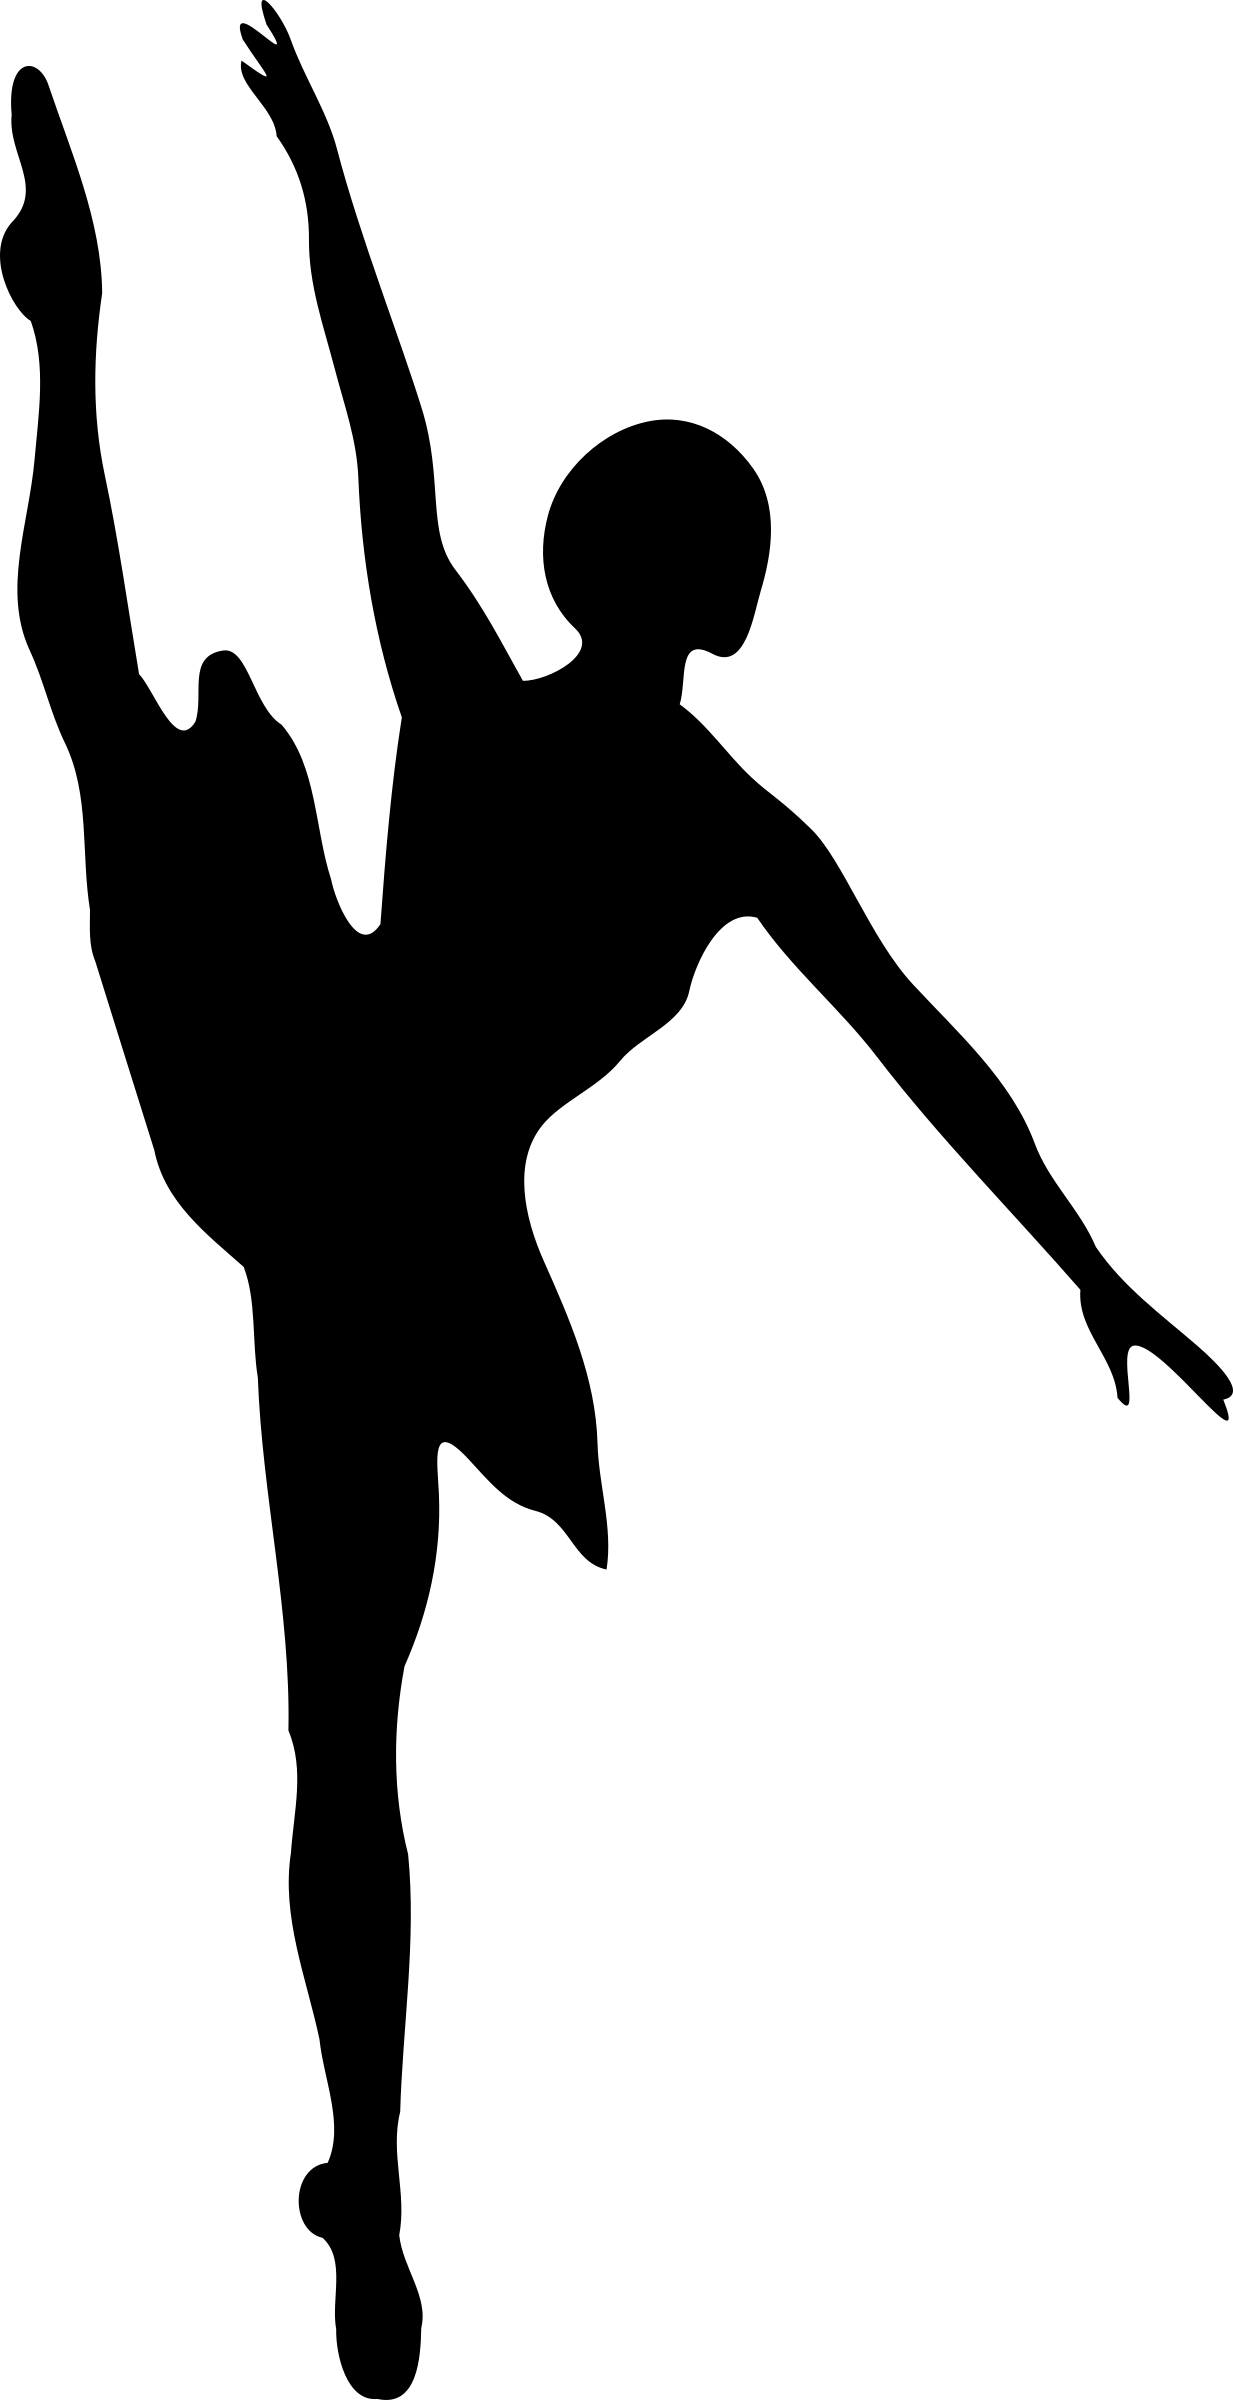 Ballet Dancer - Ballet Dancer Silhouette (1233x2400)